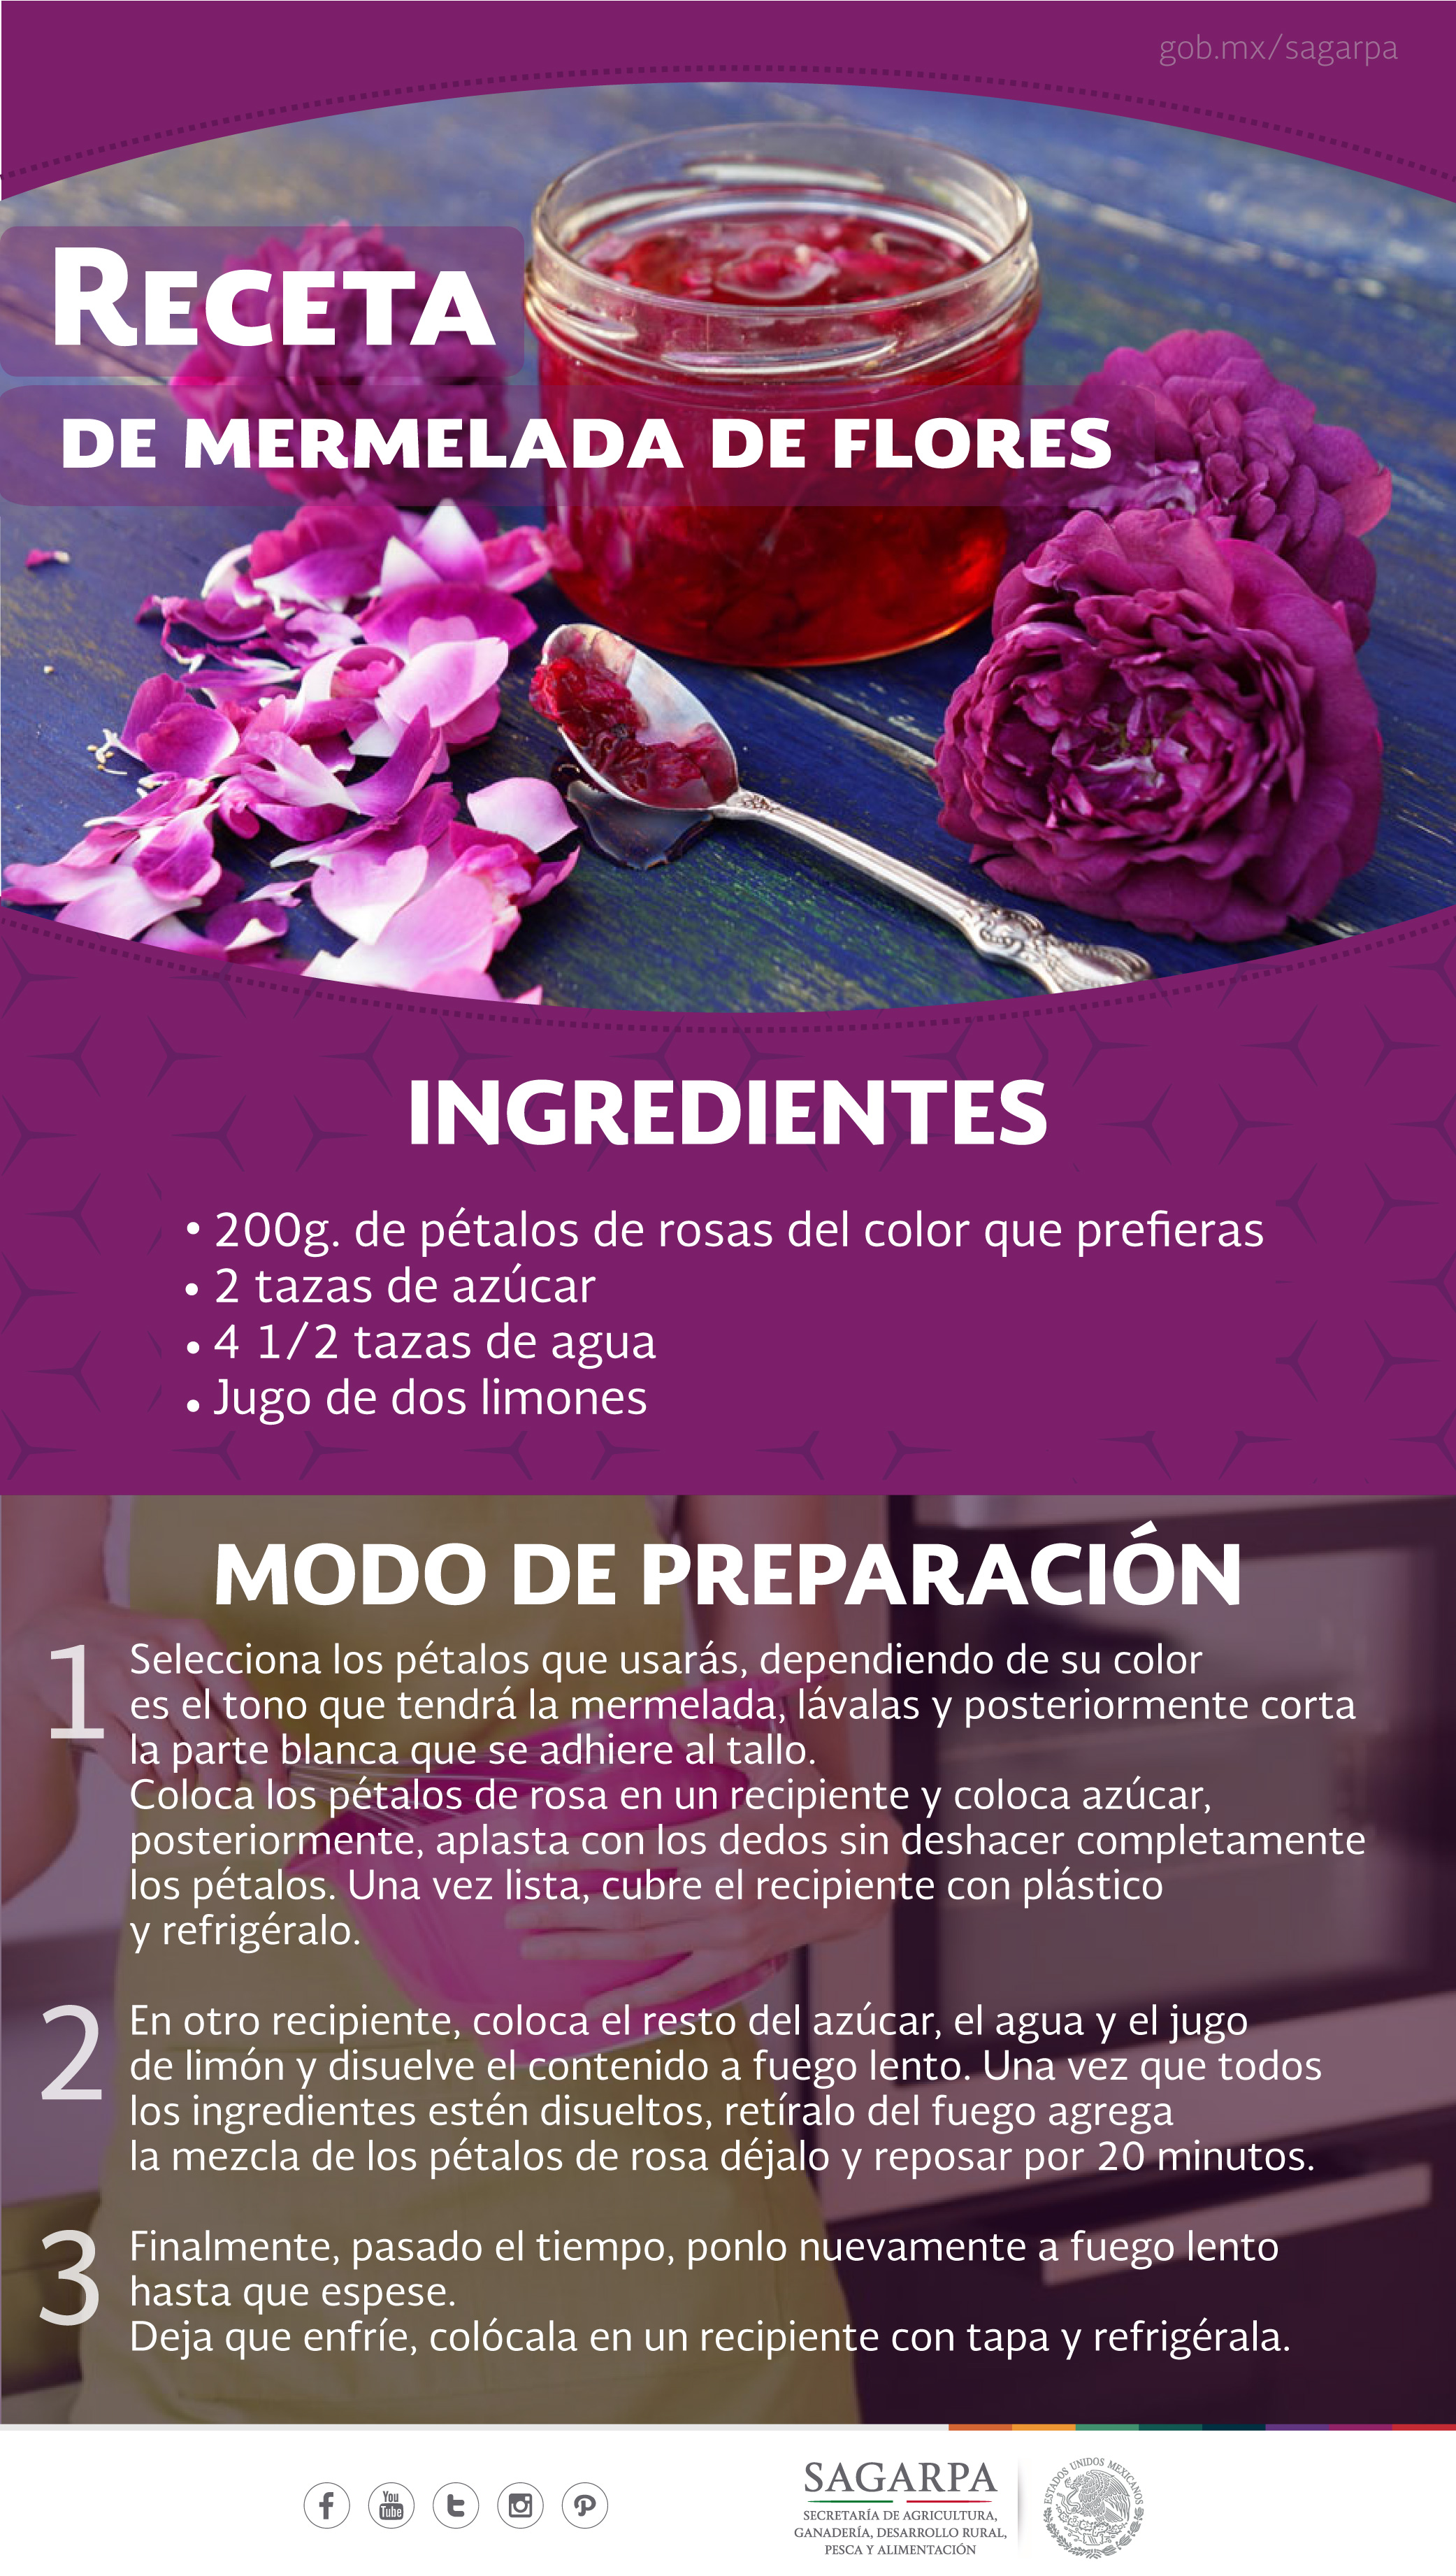 /cms/uploads/image/file/276479/receta_flores-01.jpg